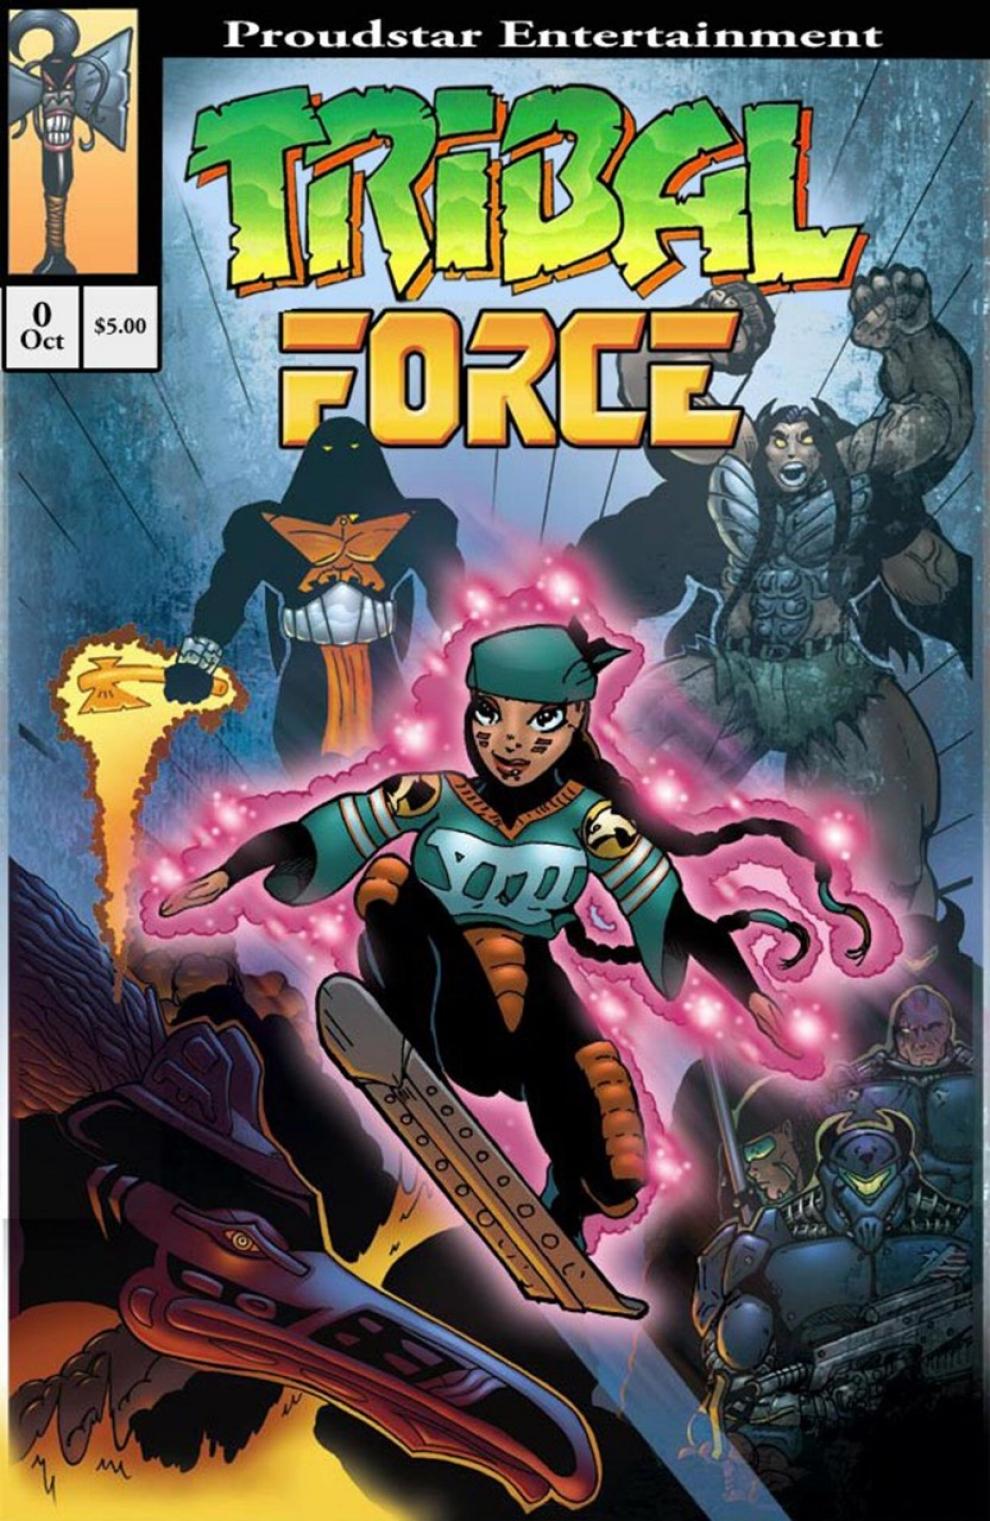 Native American Superheroes Storm Comic Books | Al Jazeera America